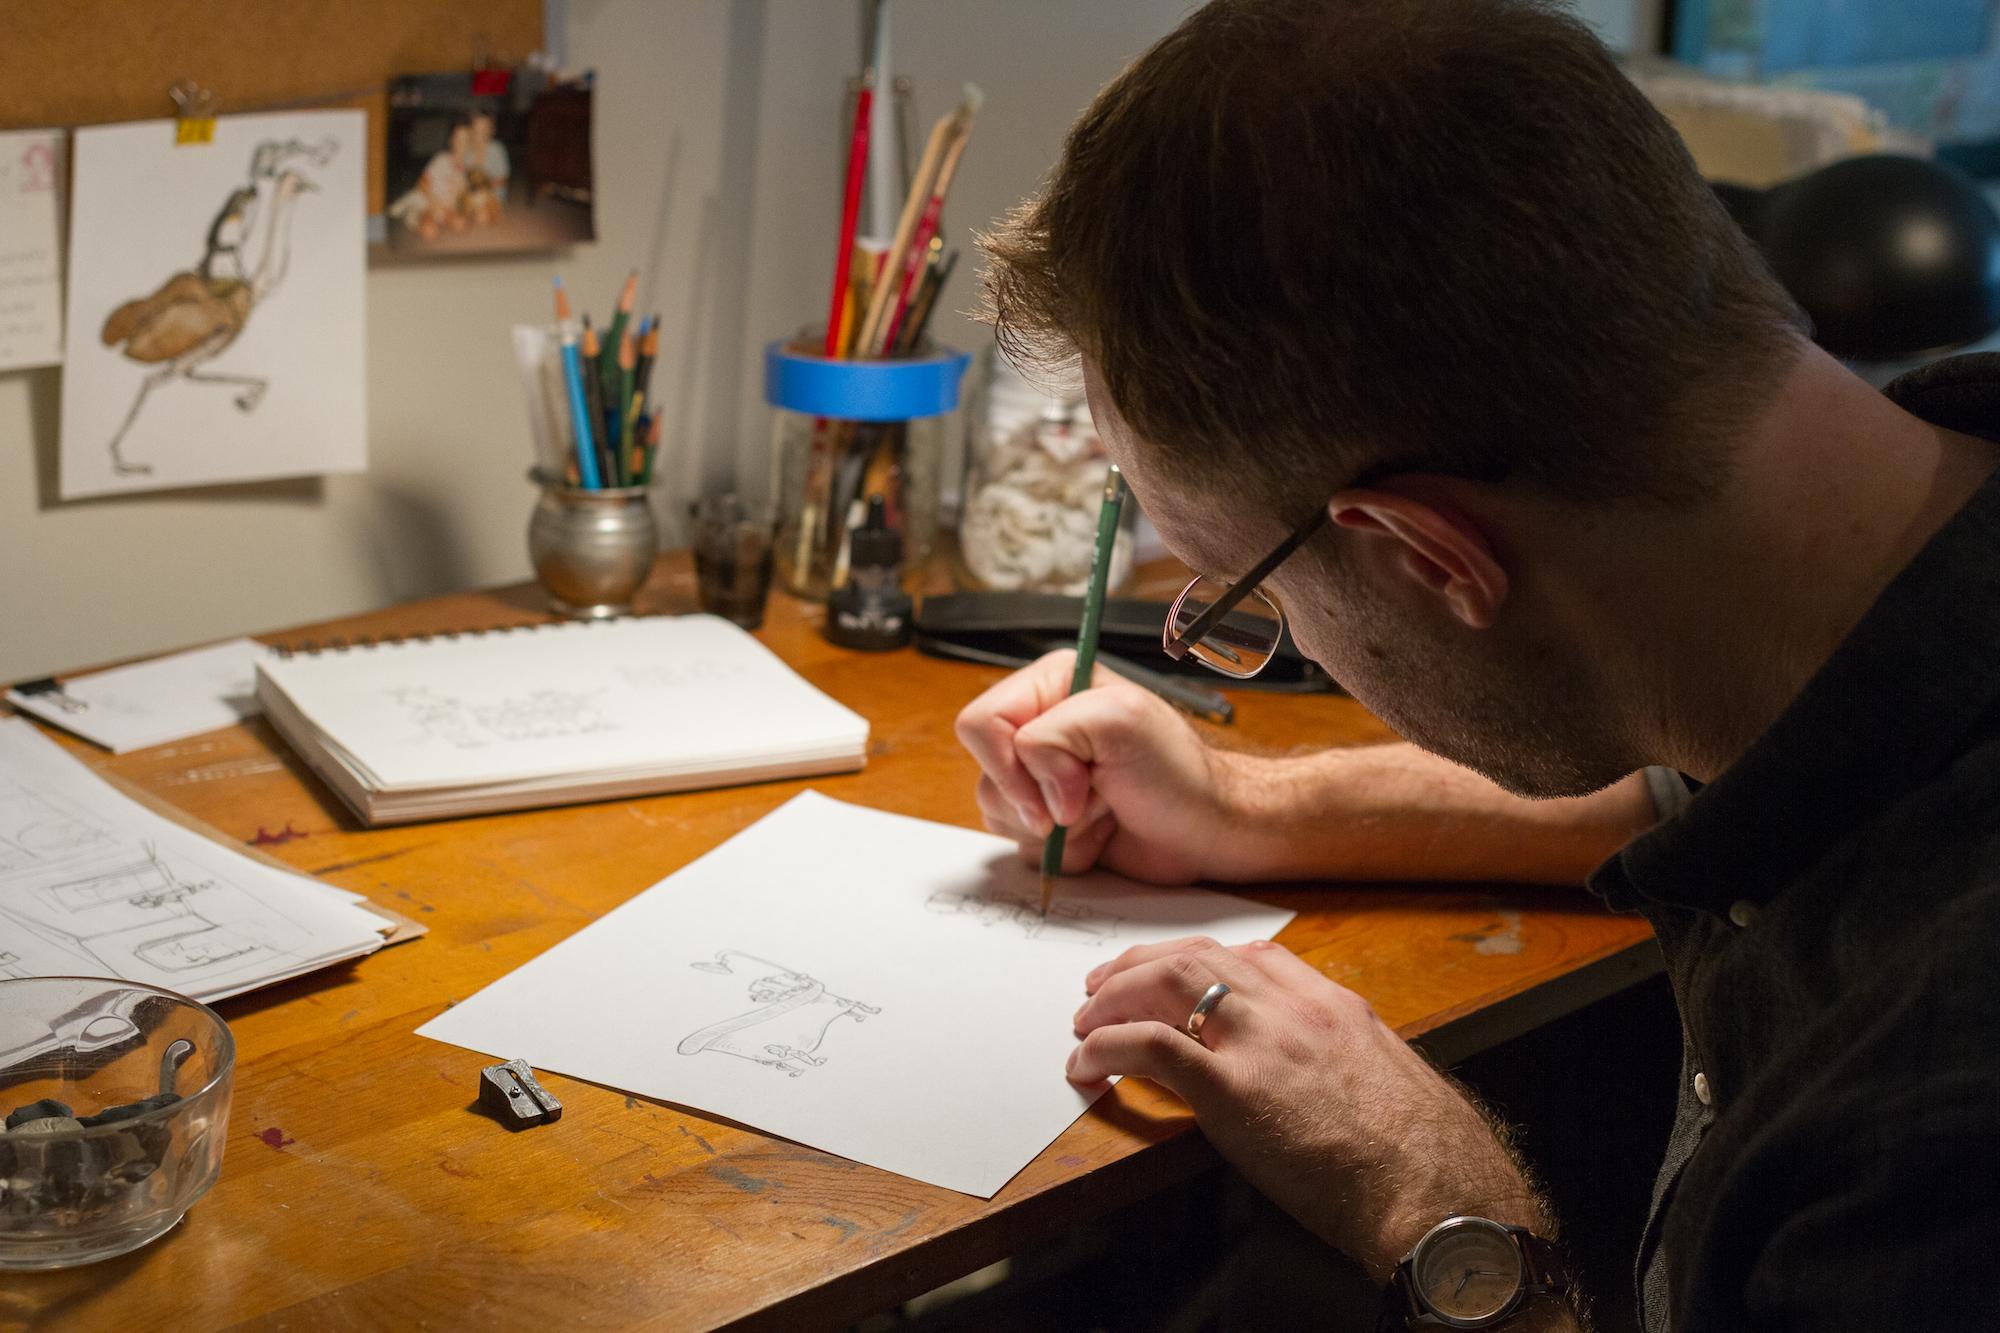 Nick Makes Custom Illustrations - About Nick.jpg